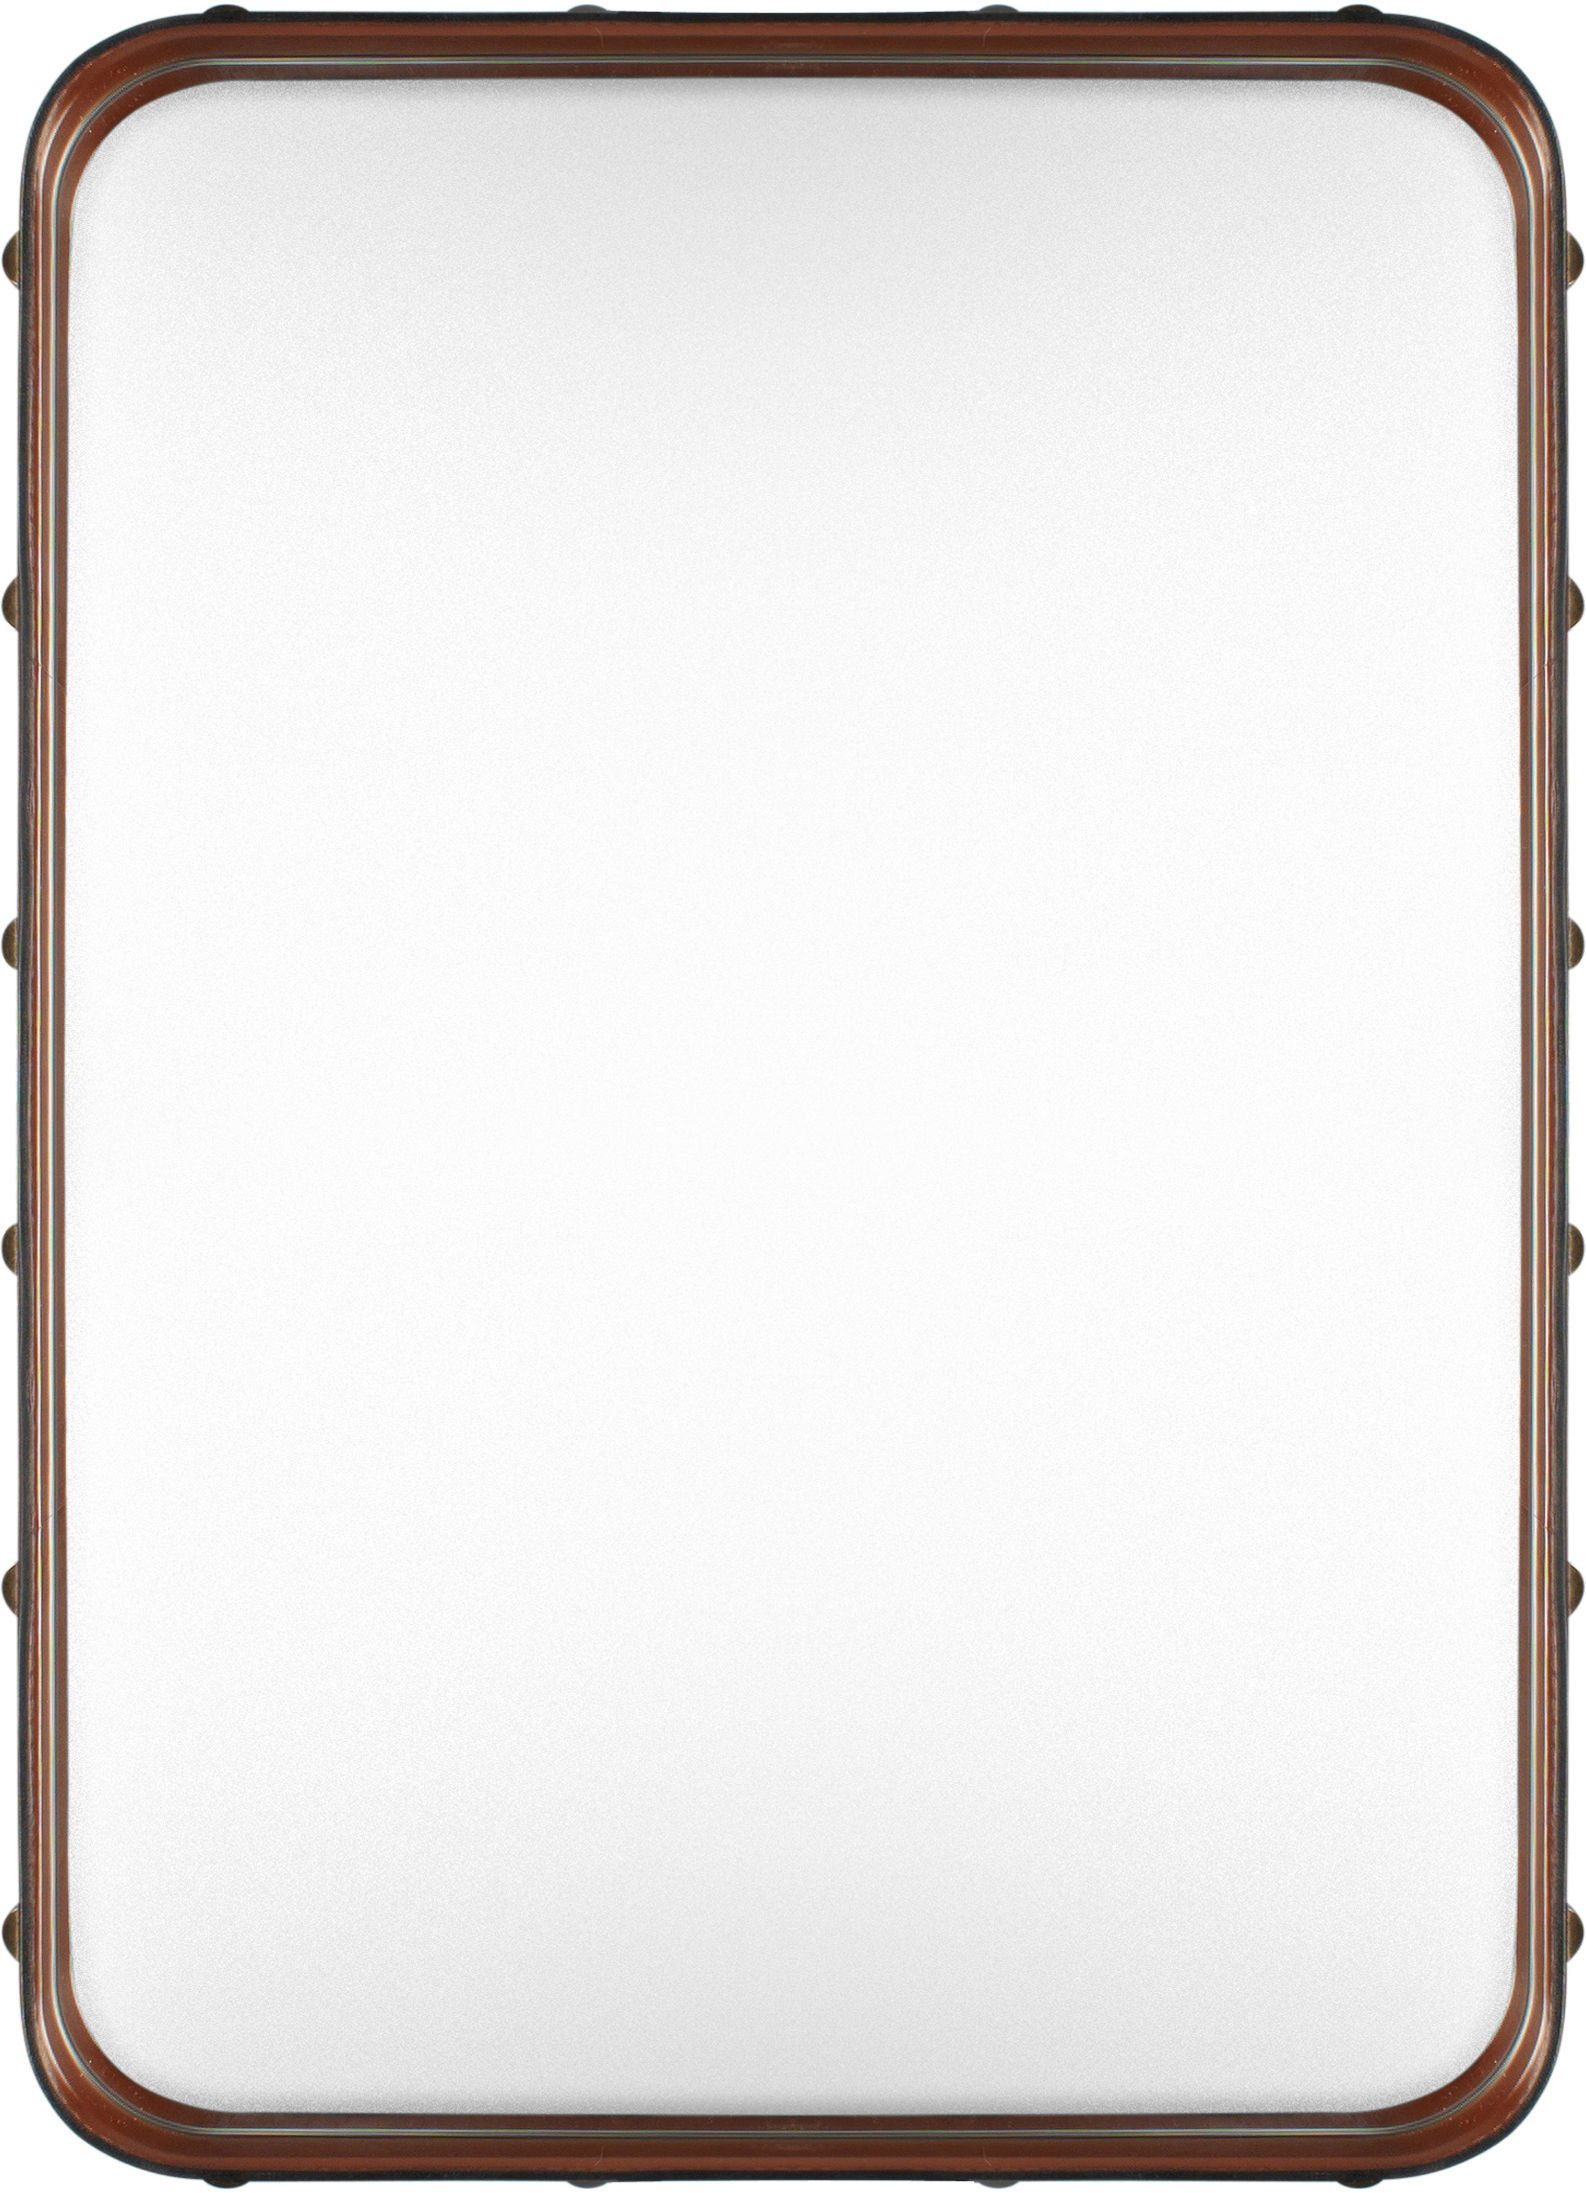 Déco - Miroirs - Miroir mural Adnet / 70 x 48 cm - Réédition 50' - Gubi - Cuir naturel - Cuir, Laiton